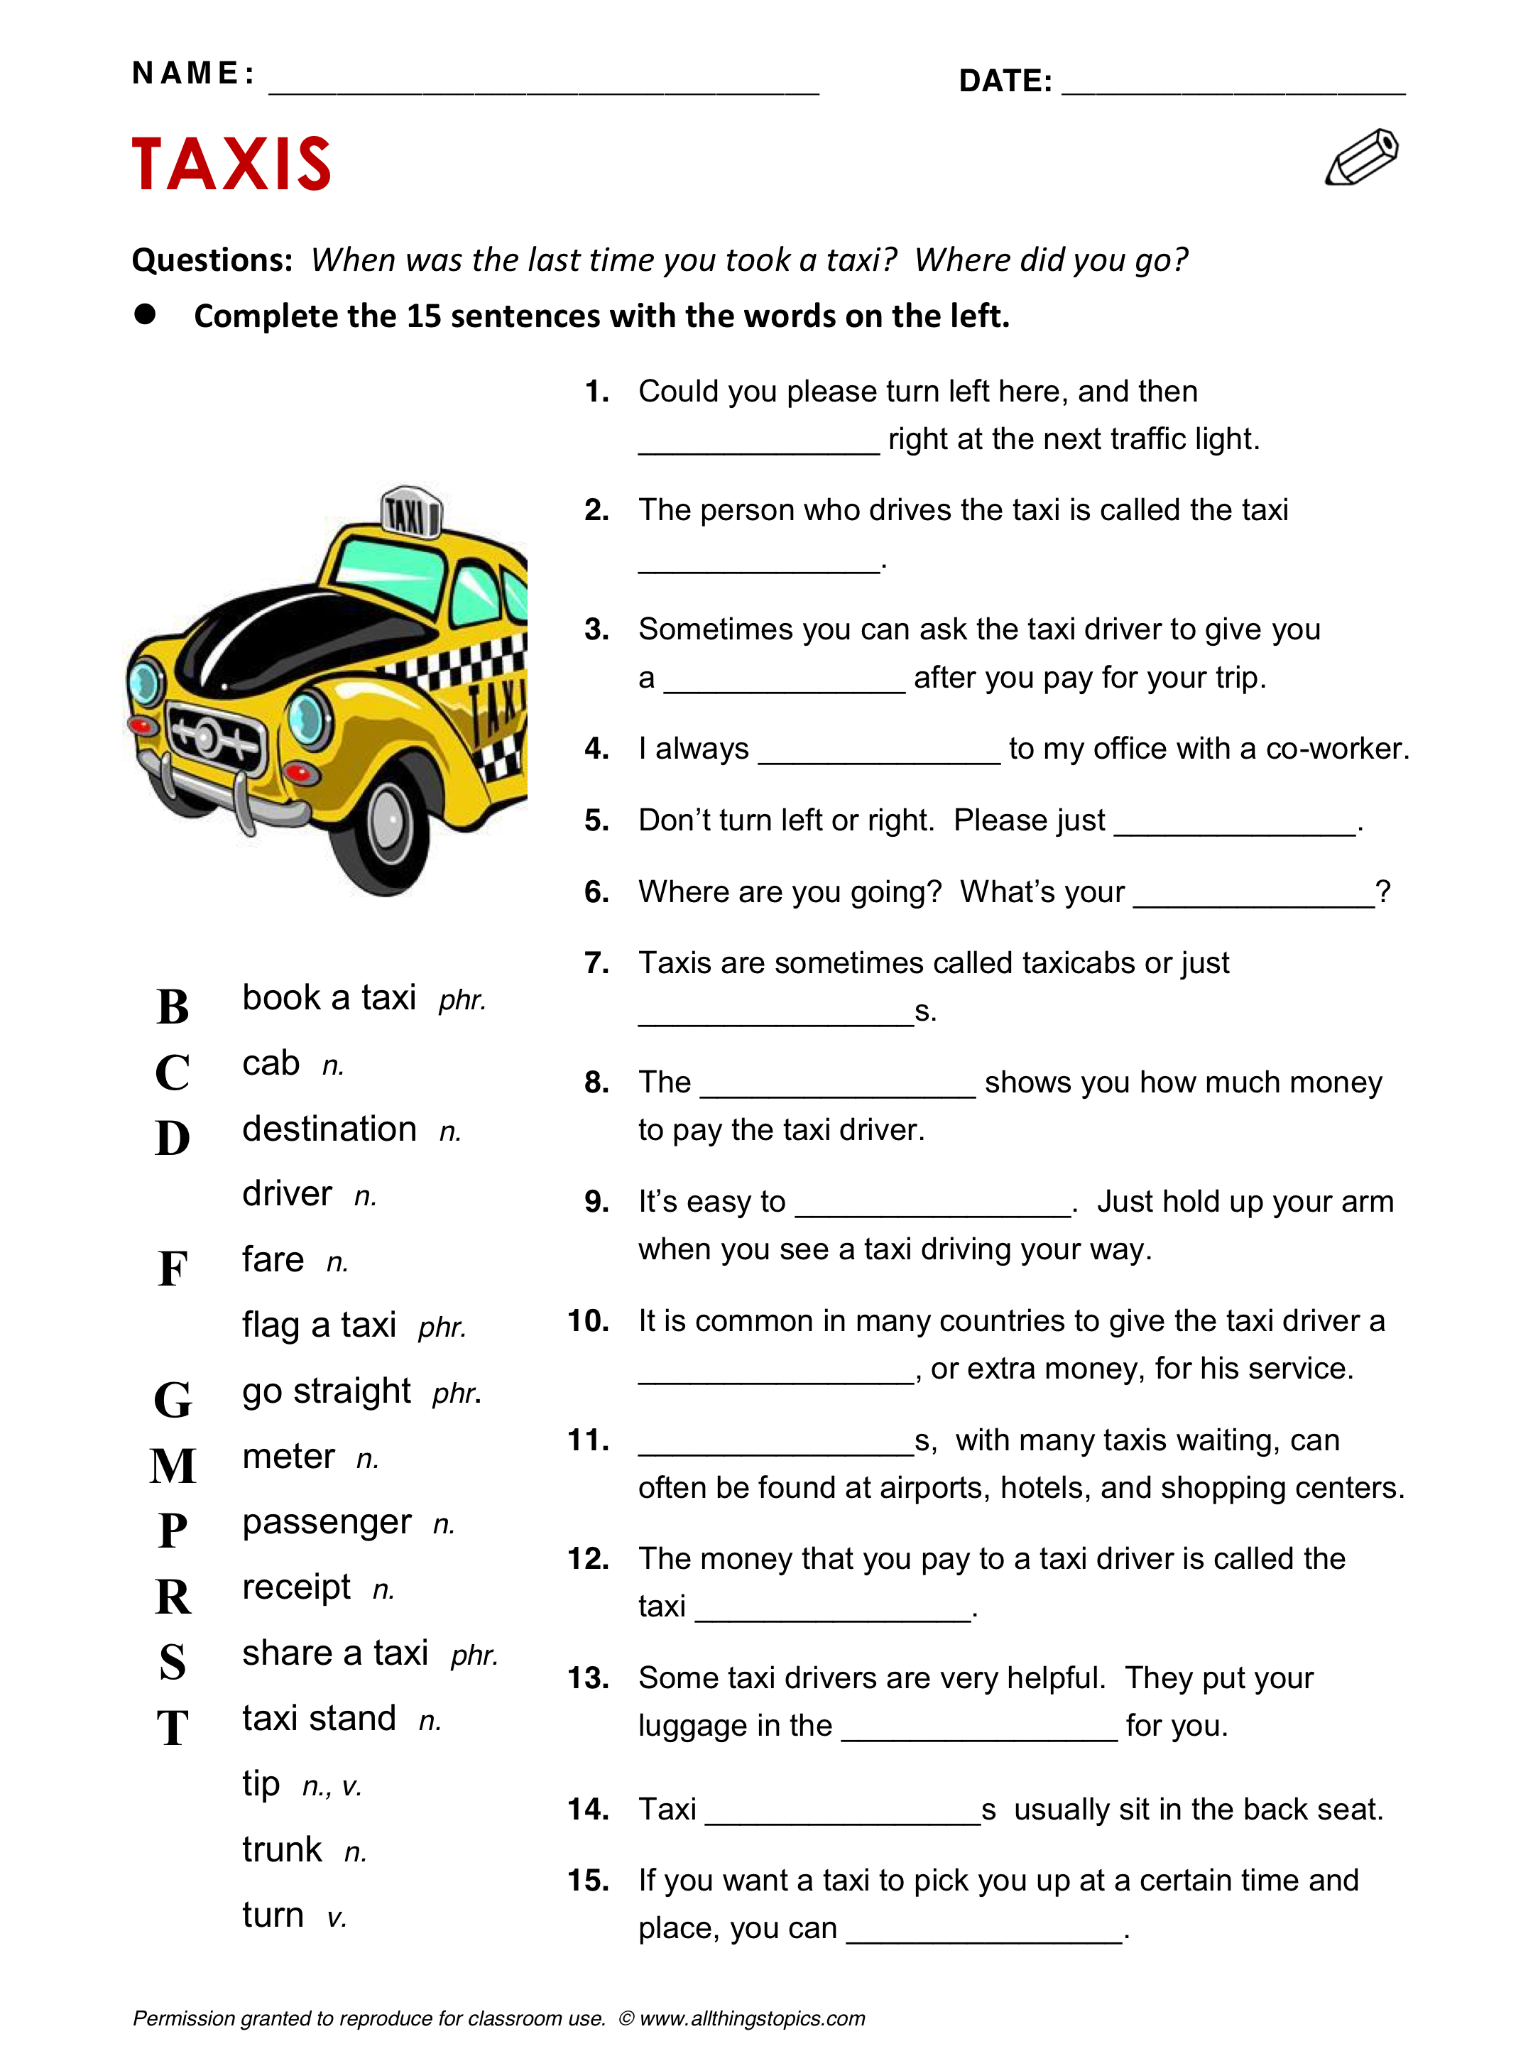 Taxis Taxi Vocabulary Esl English Phrases